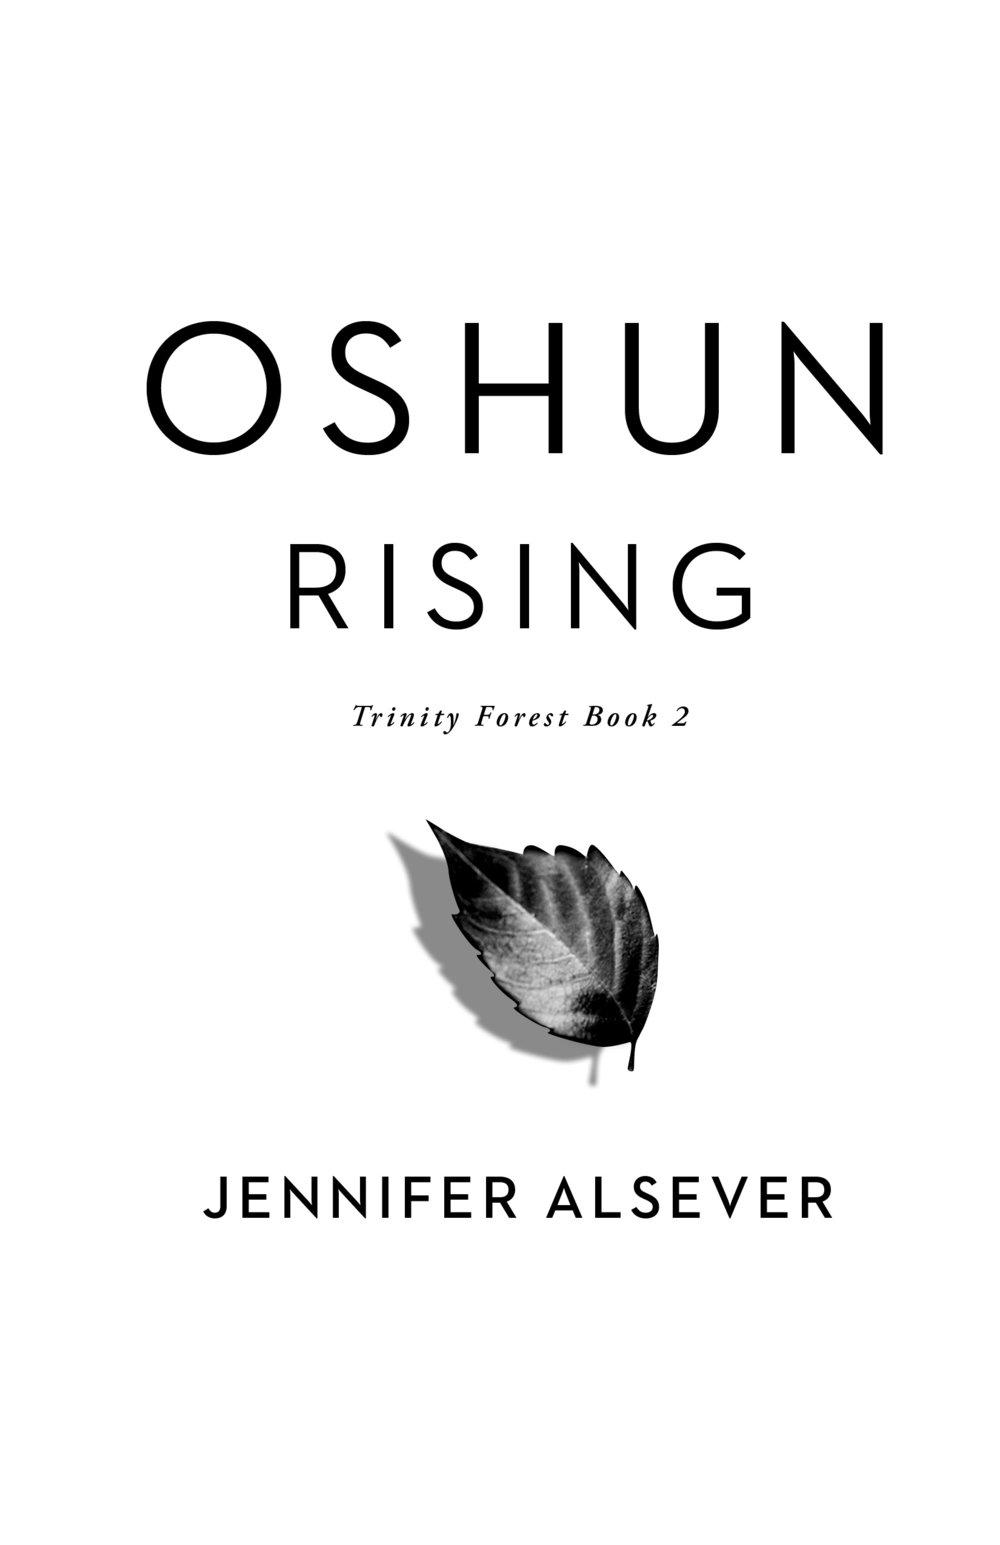 Oshun_Rising_title_page_8-26.jpg